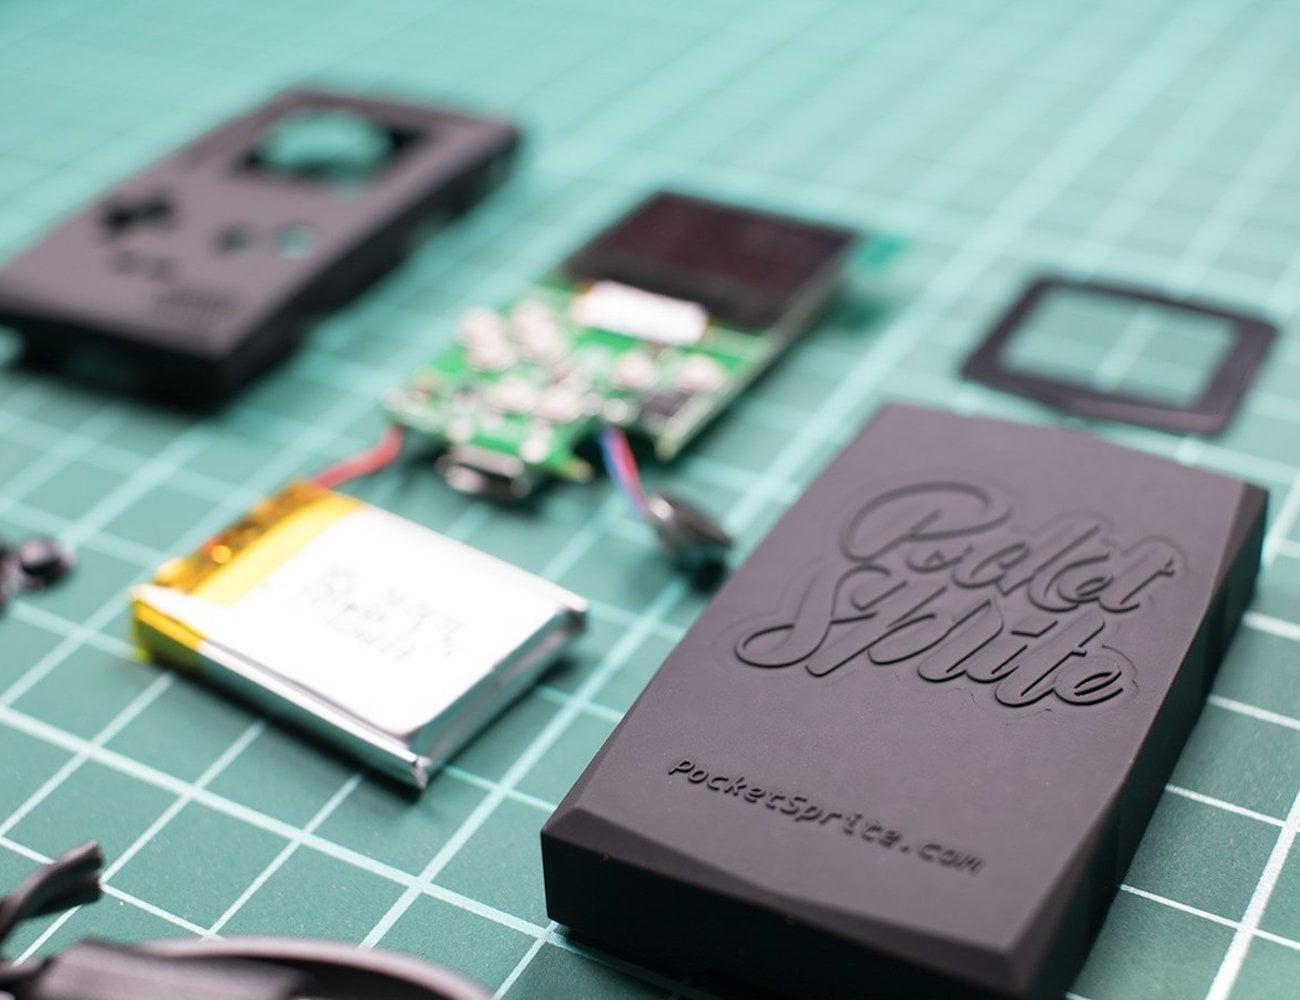 PocketSprite Portable Retro Gaming Device